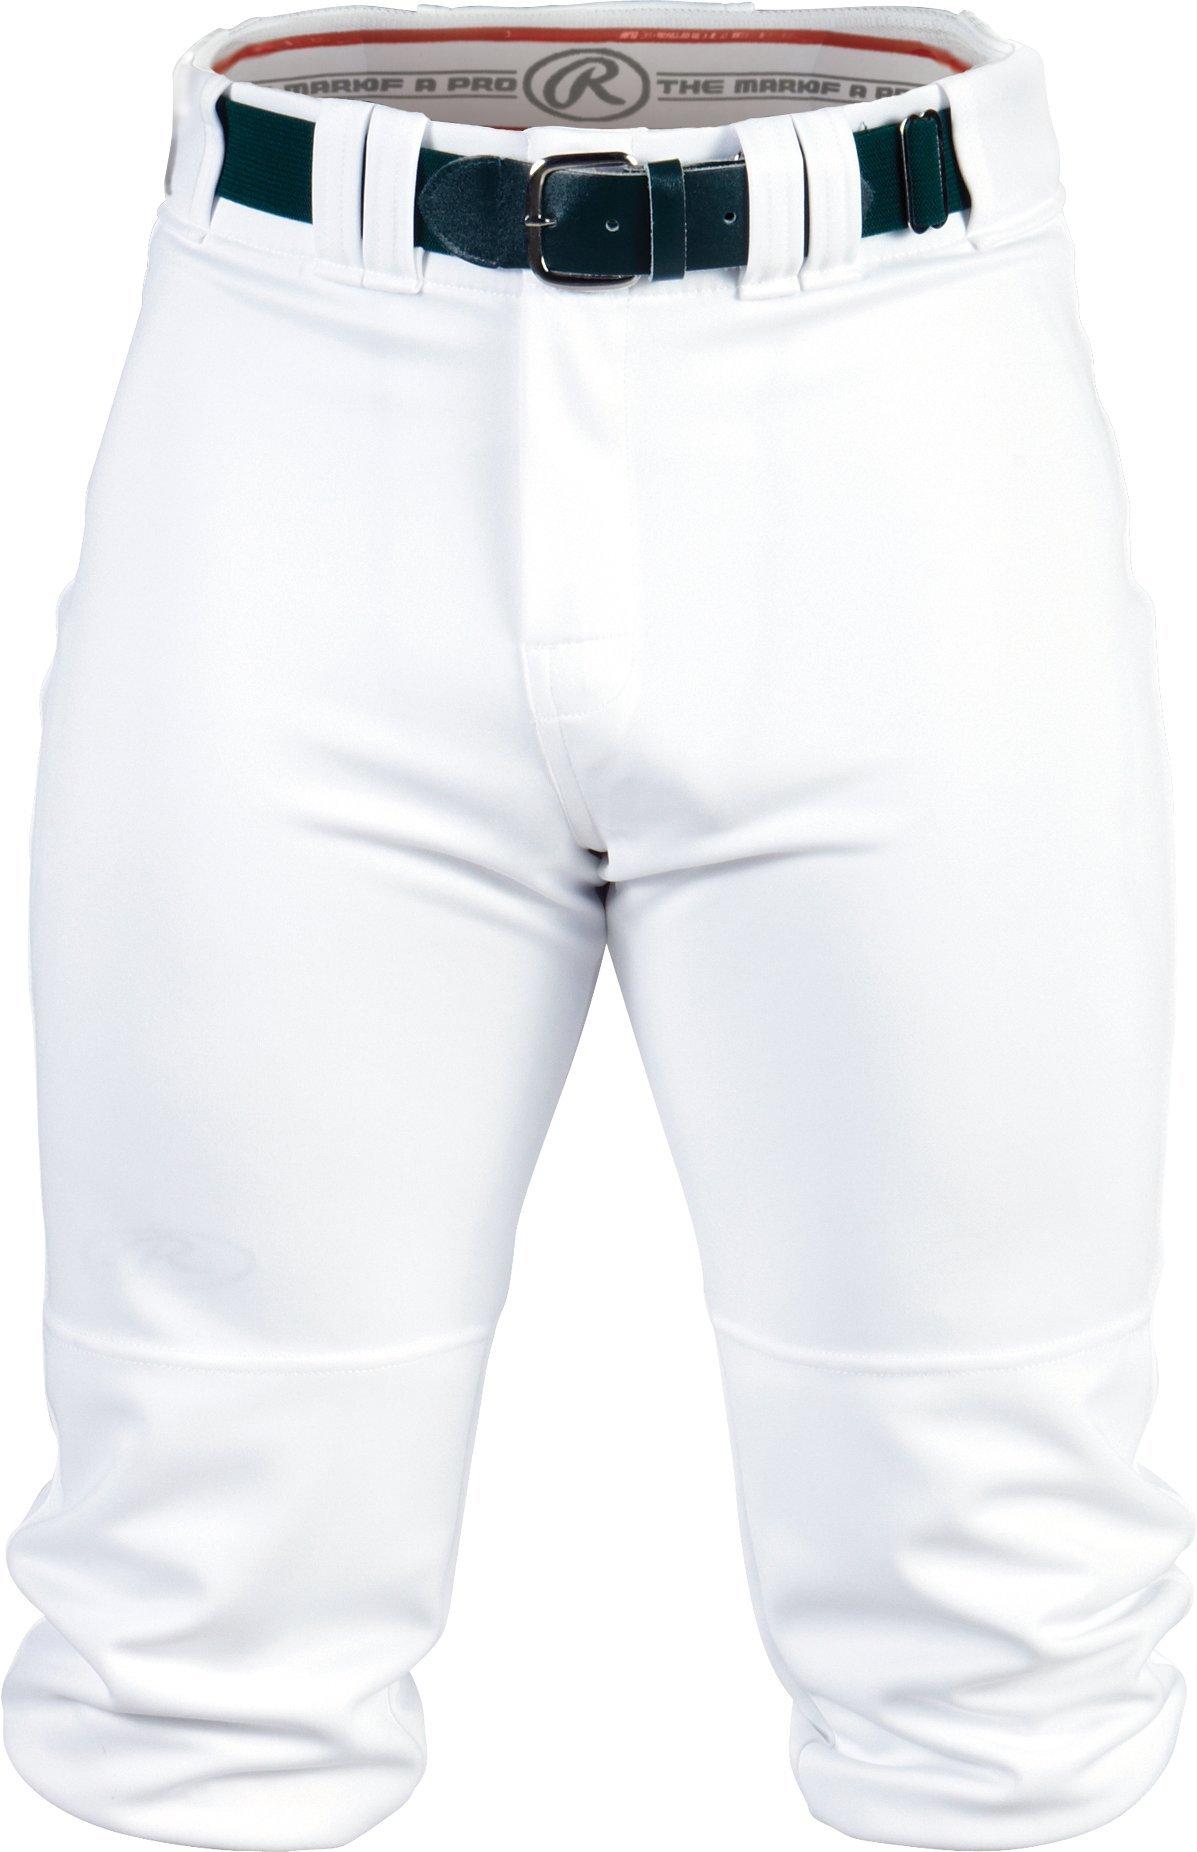 Rawlings Men's Knee-High Pants, Large, White by Rawlings